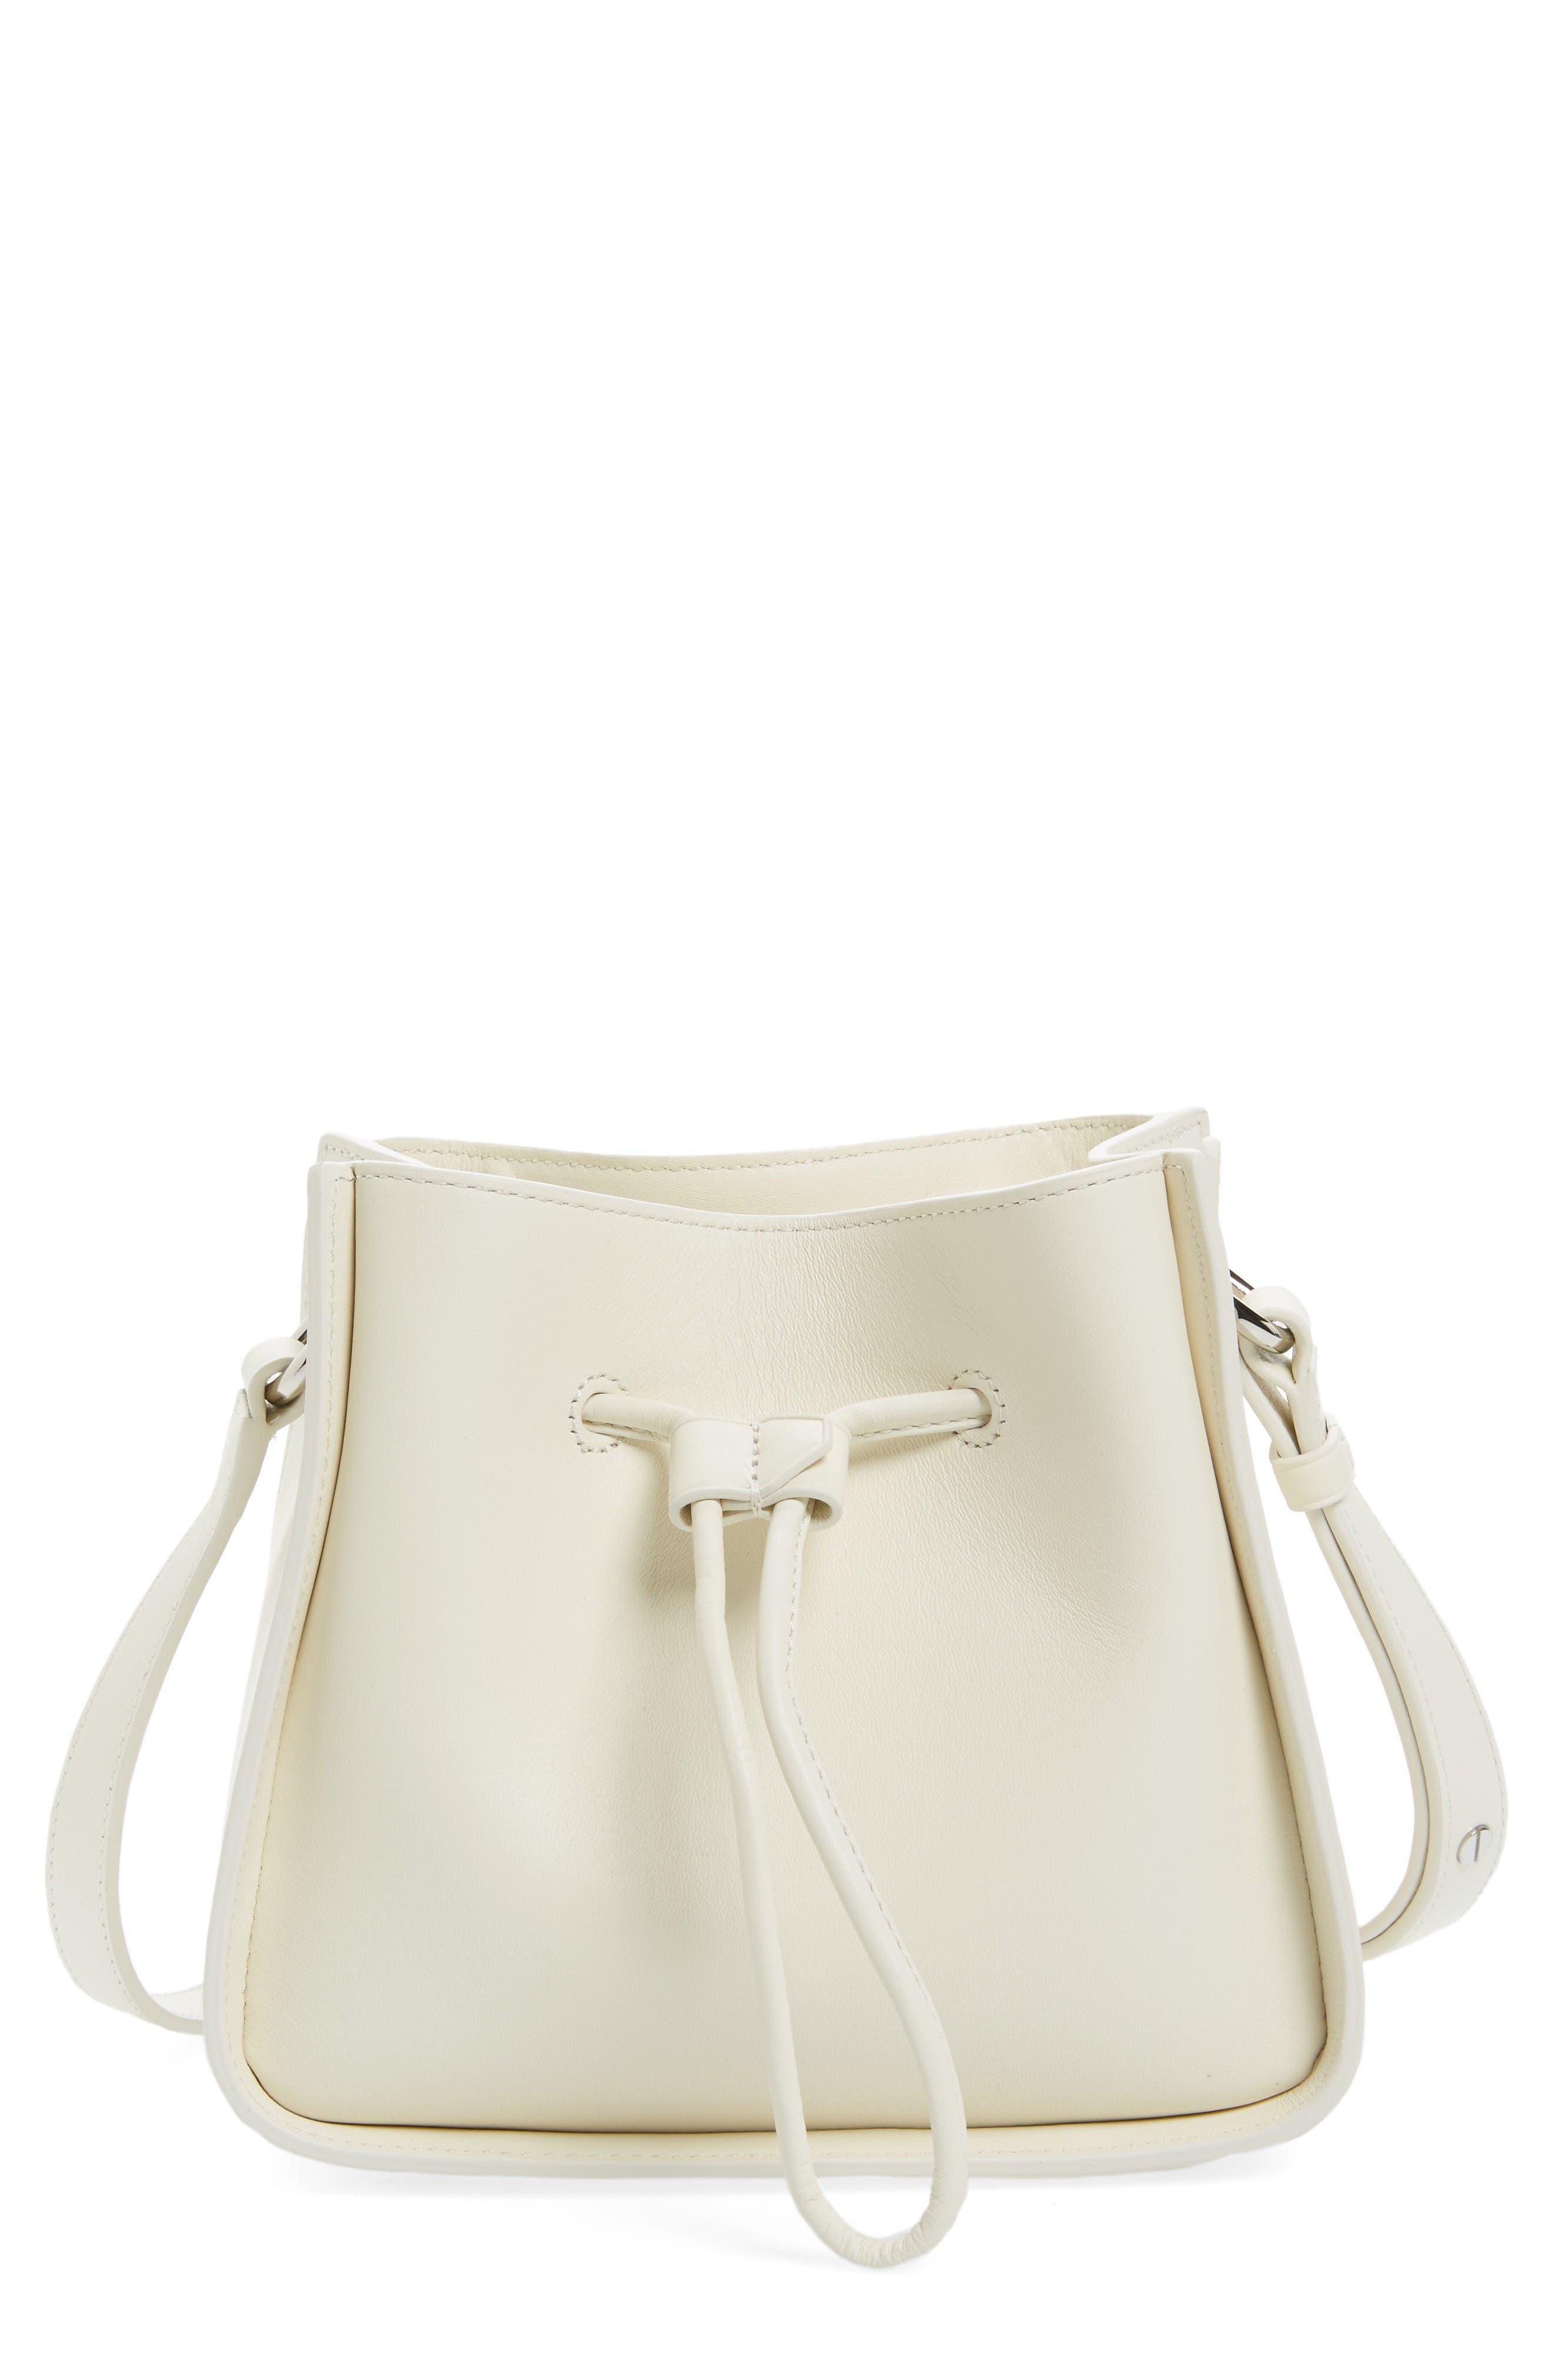 Alternate Image 1 Selected - 3.1 Phillip Lim Mini Soleil Leather Bucket Bag